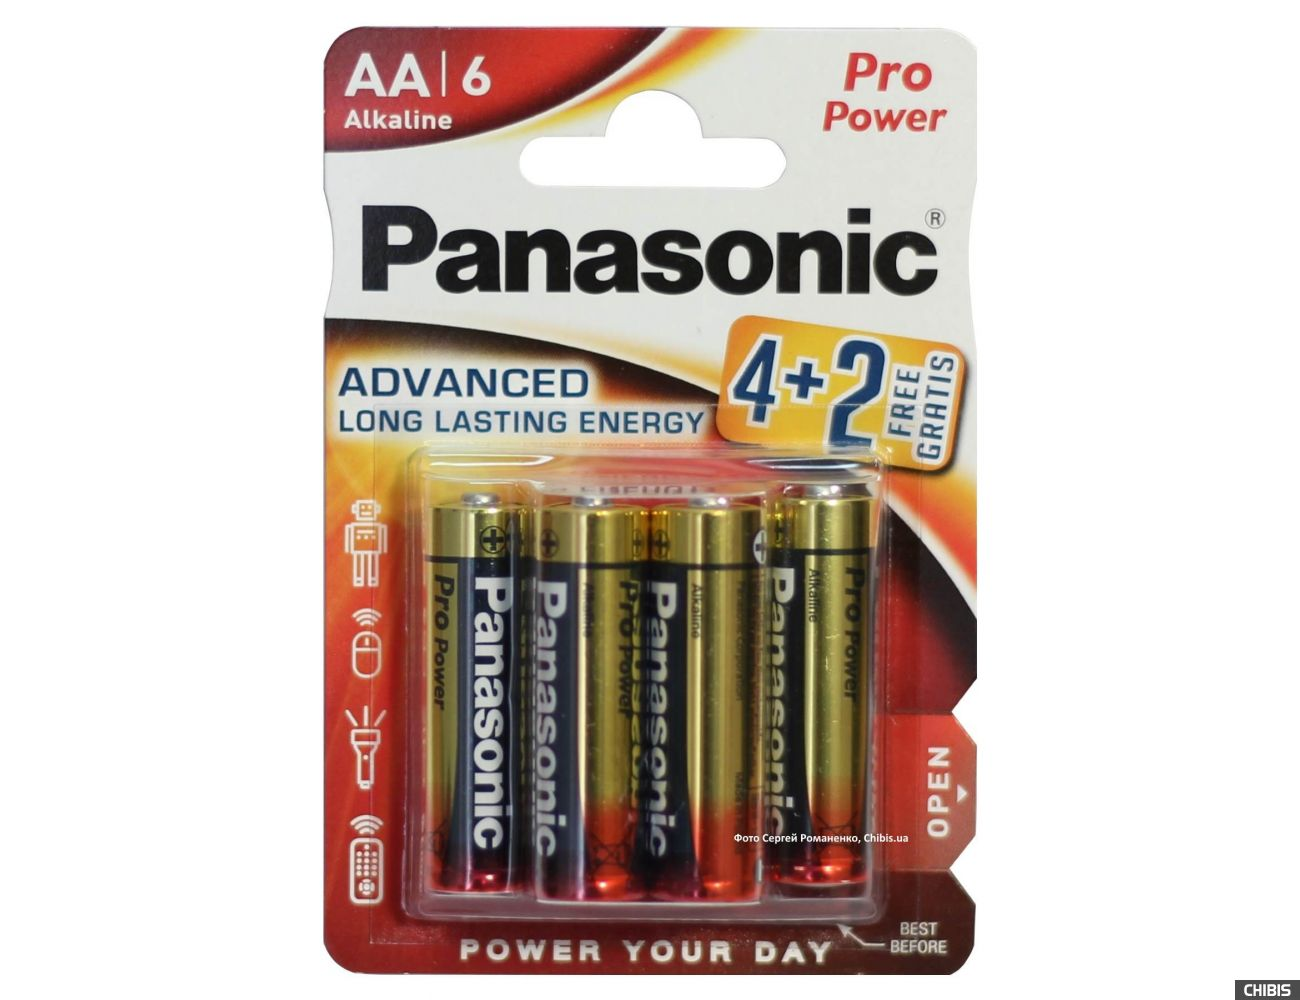 Батарейка Panasonic AA Pro Power Alkaline 1.5V LR6PPG/6BP 4-2F блистер 6 шт (4+2)